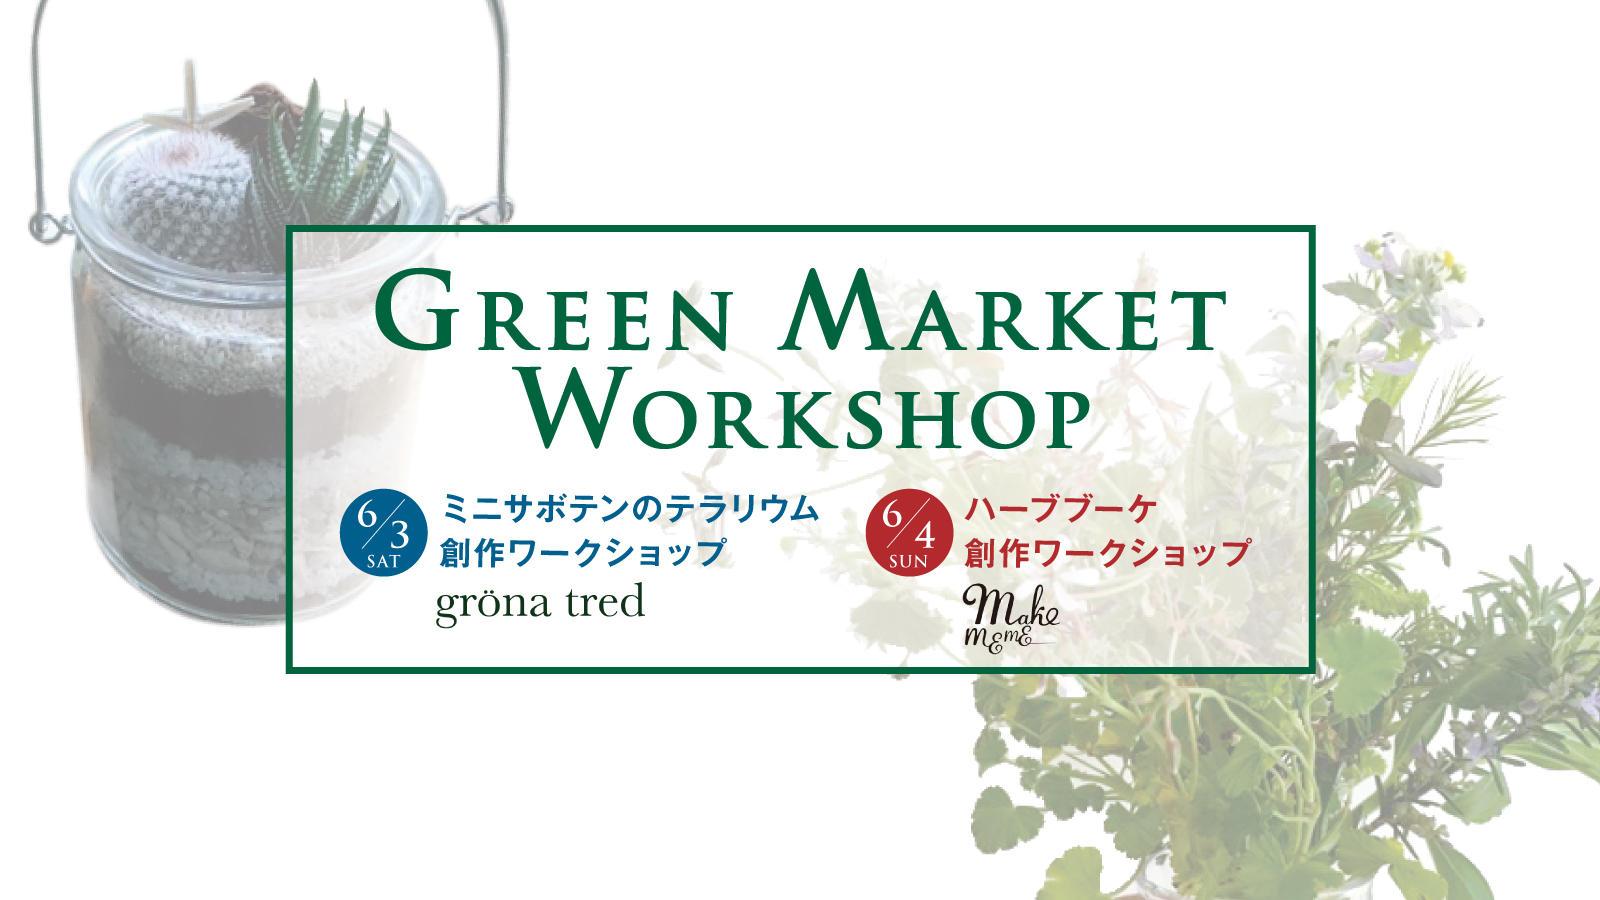 6.3sat-6.4sun 《GREEN MARKET WORK SHOP》